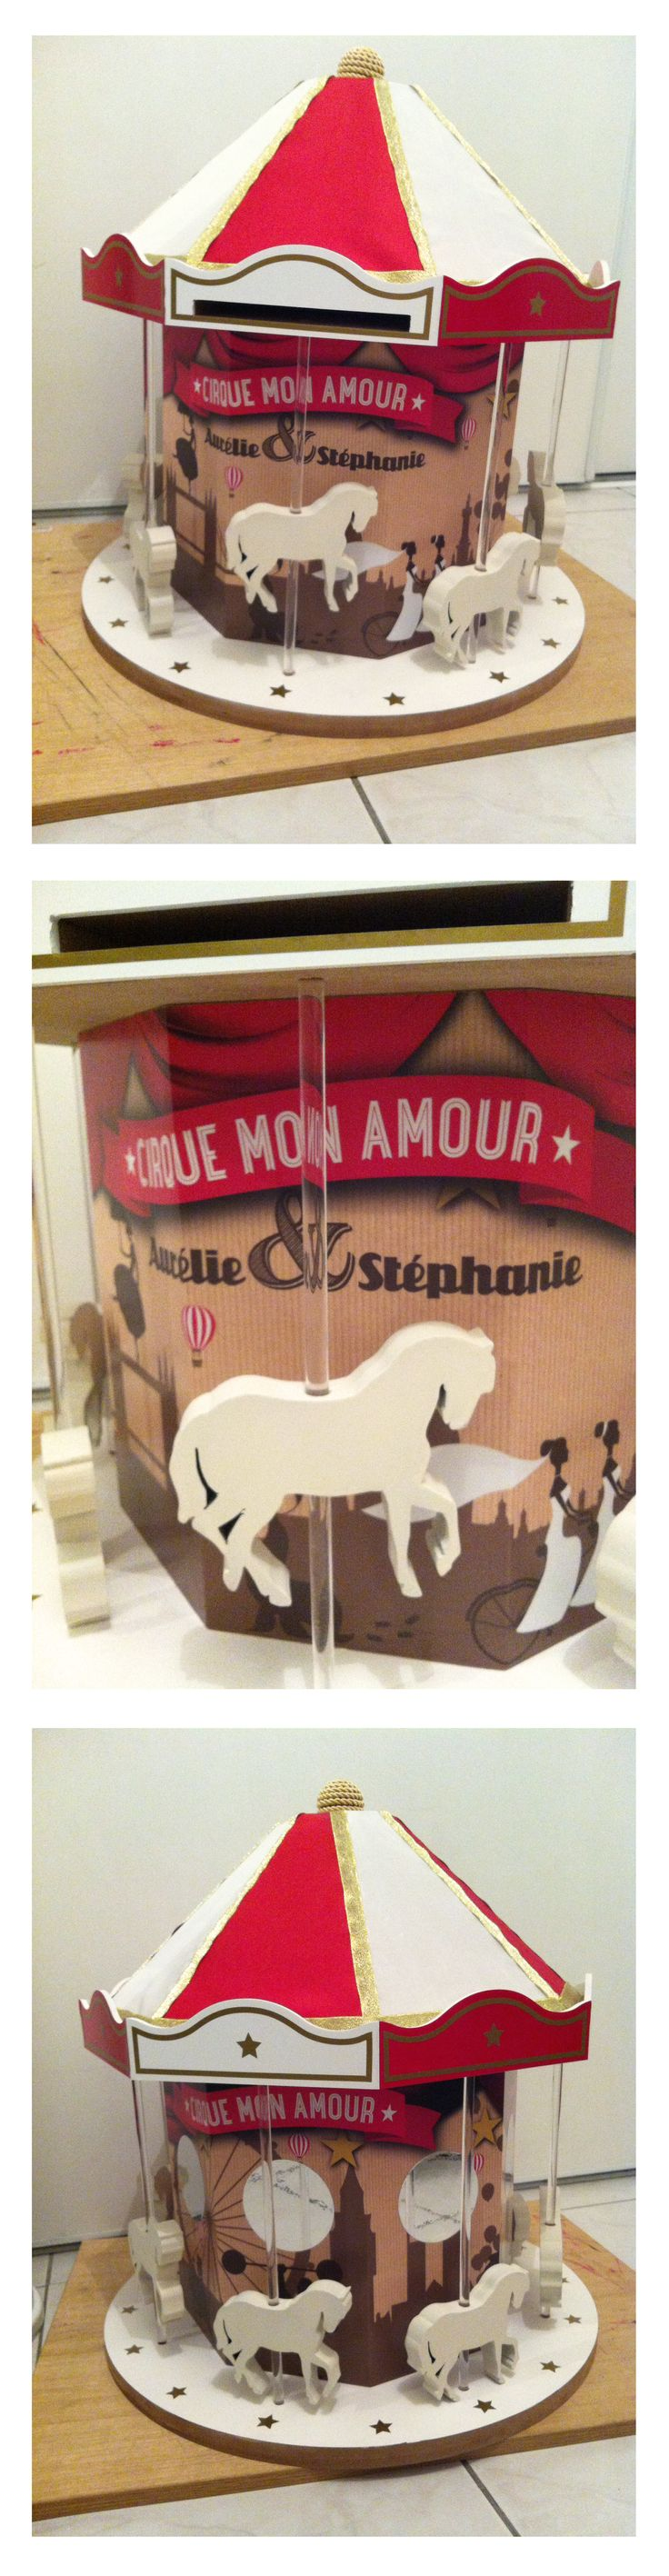 carrousel urne mariage th me cirque vintage mes cr a. Black Bedroom Furniture Sets. Home Design Ideas